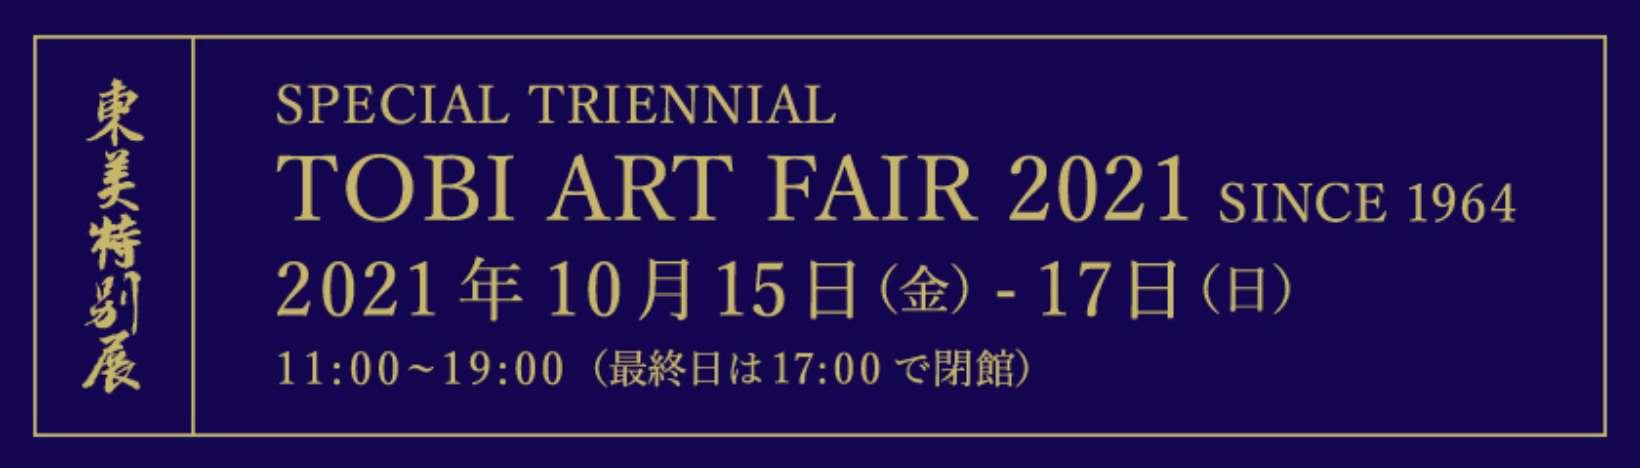 TOBI ART FAIR 2021 東美特別展